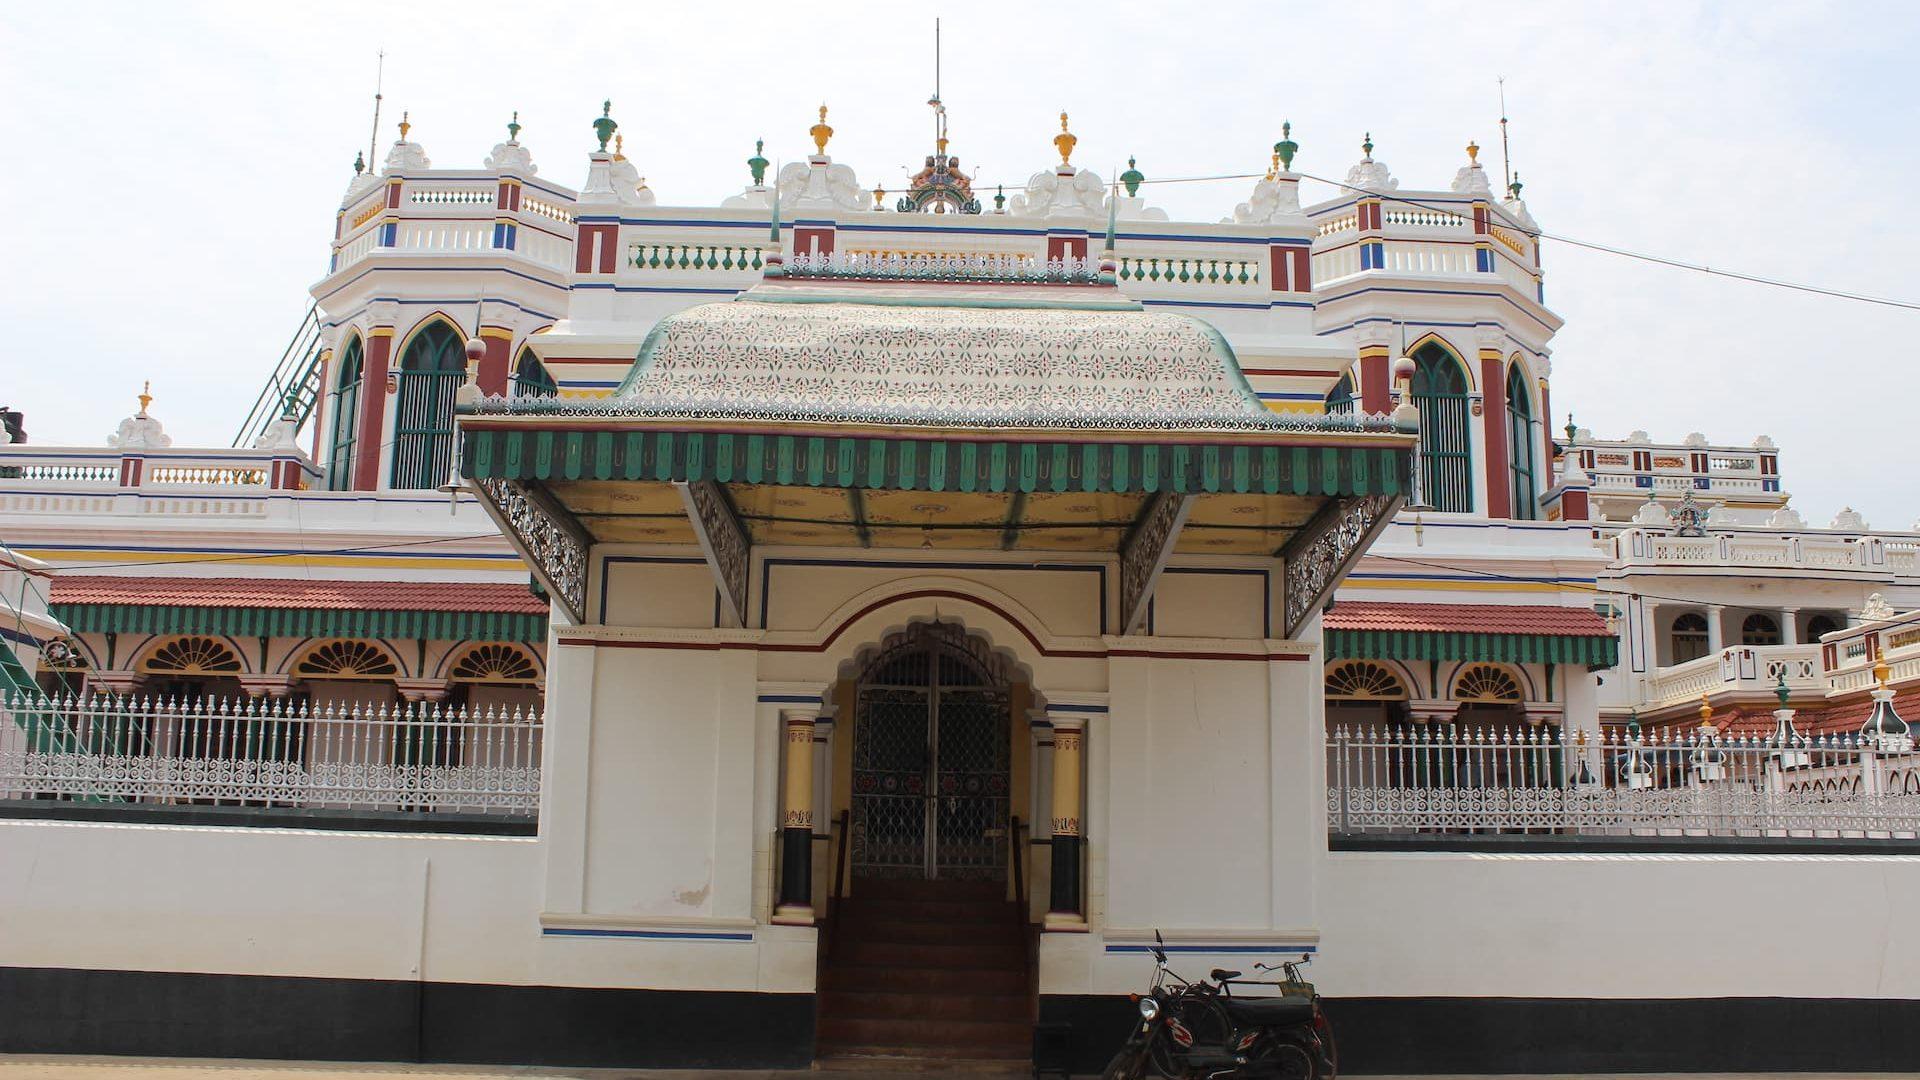 Kanadukathan Chettinad Palace Entrance